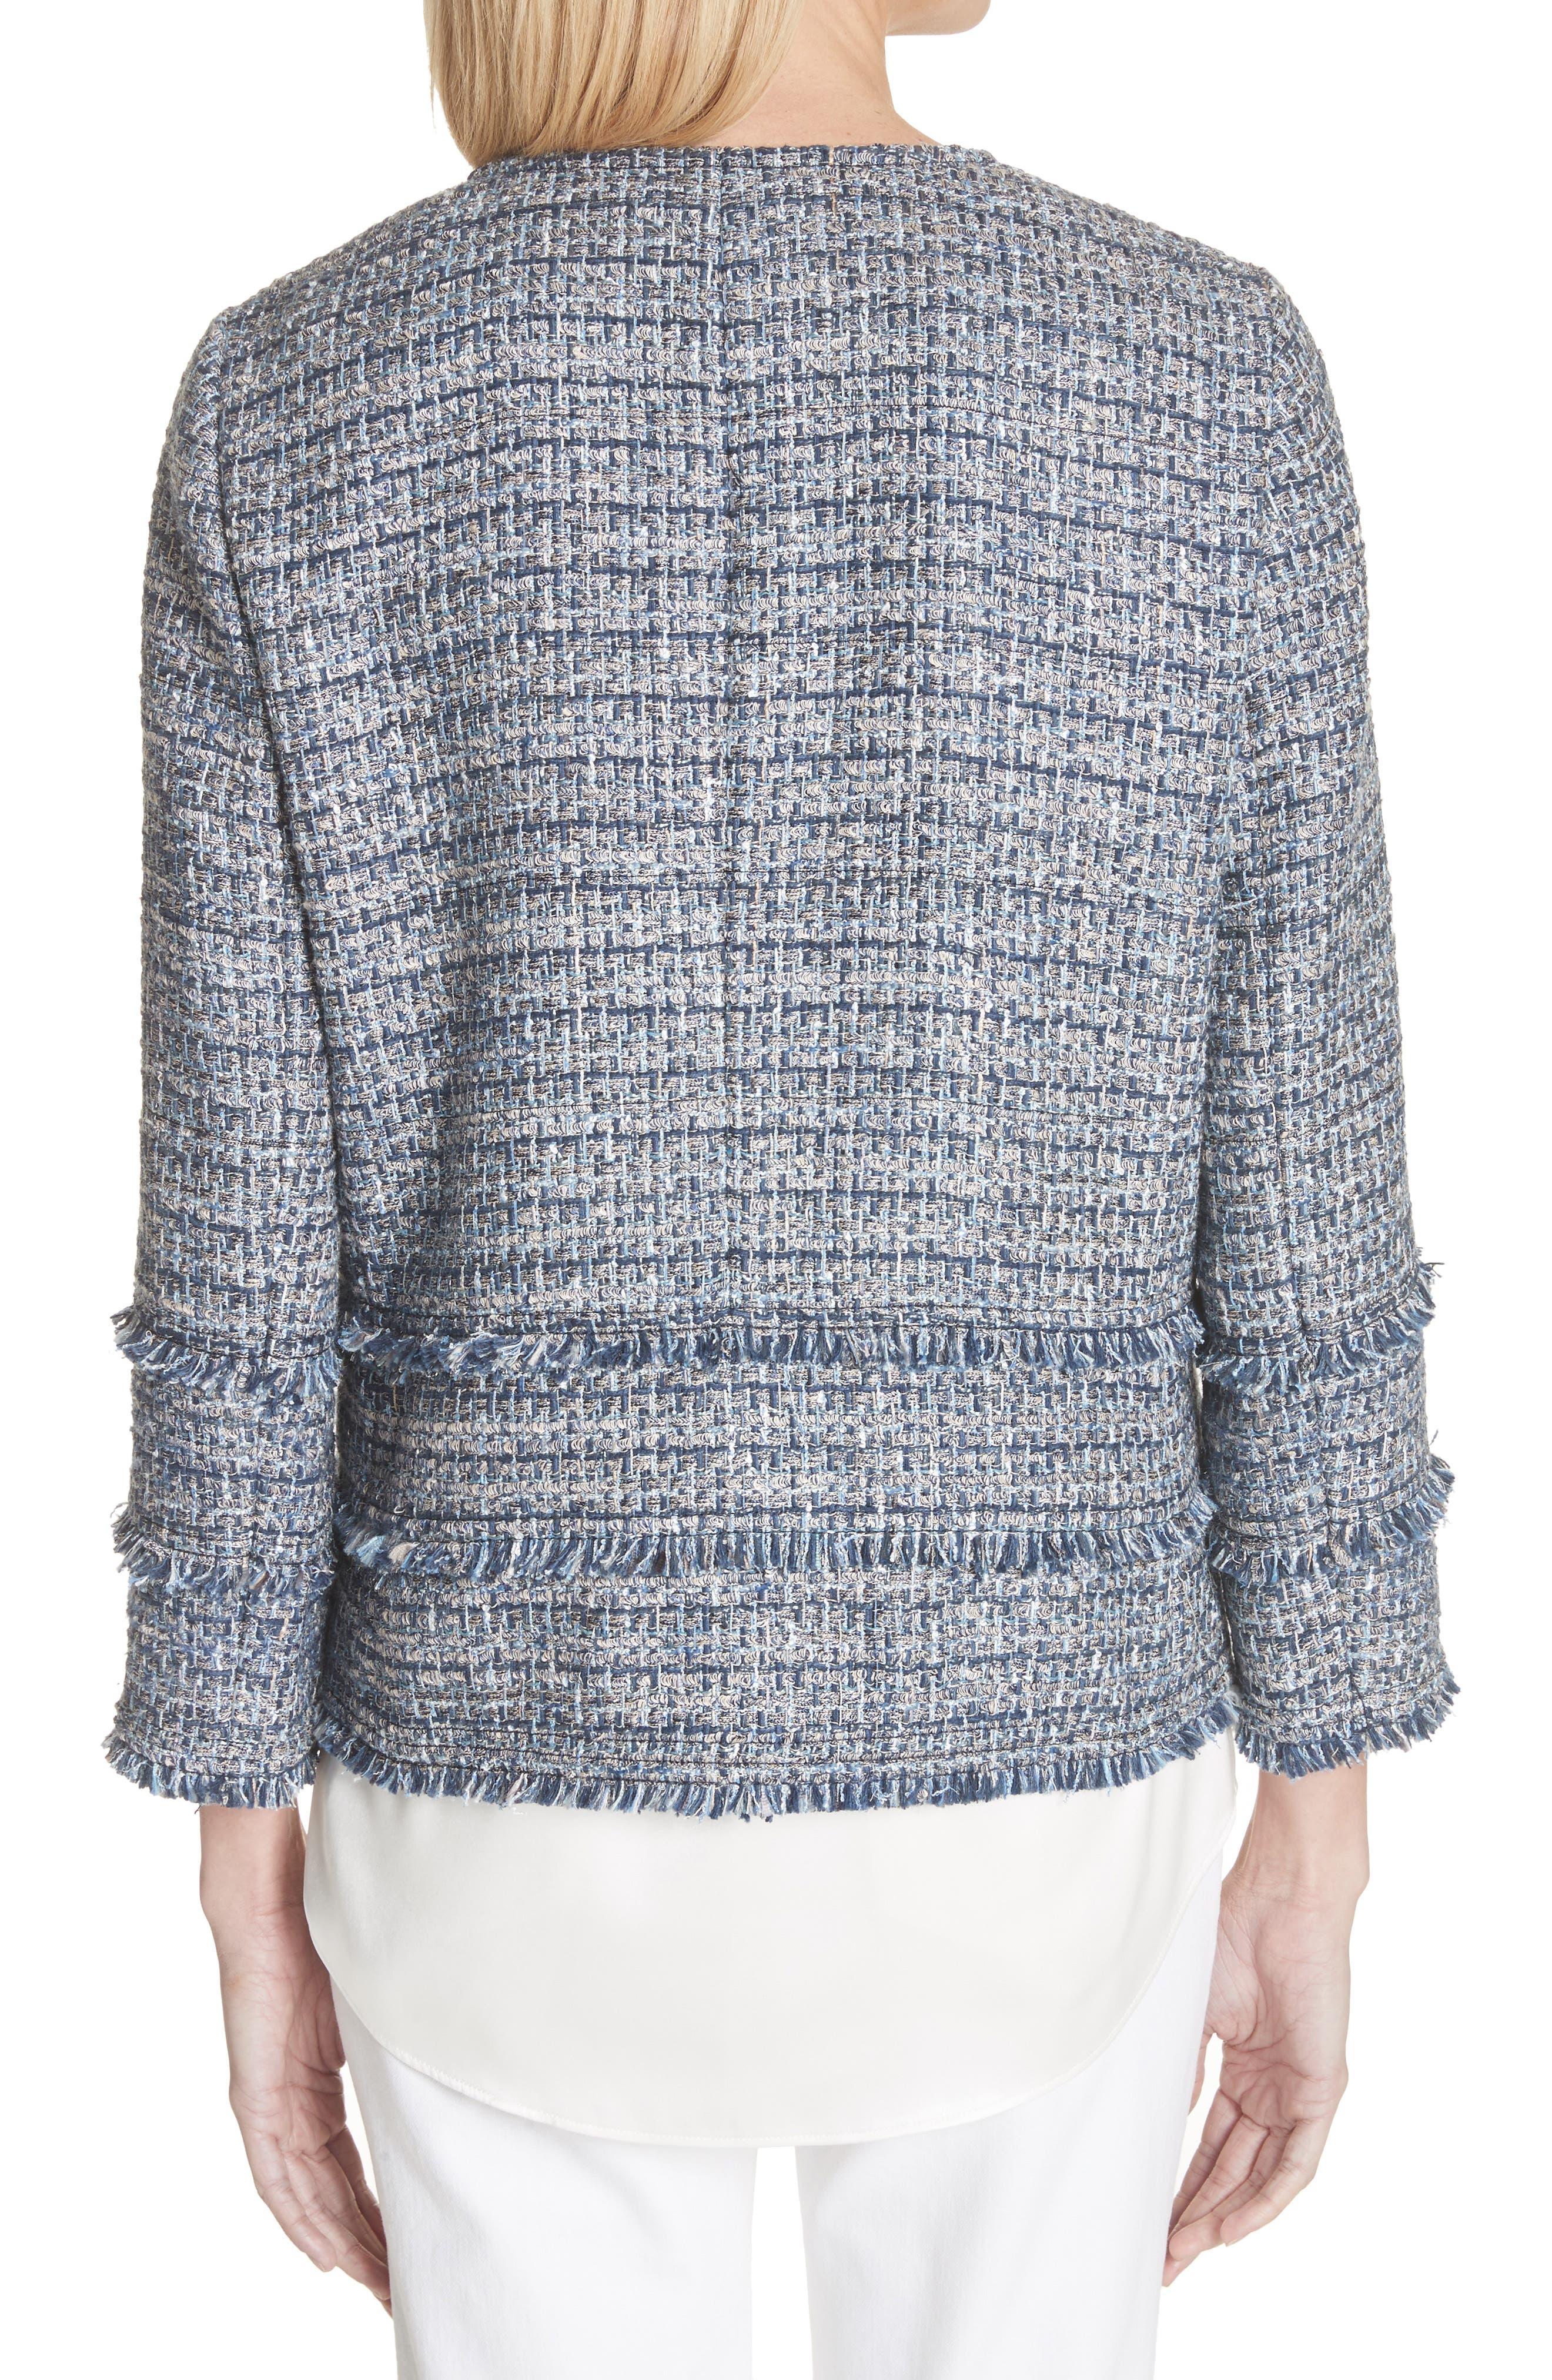 Aisha Exhibition Tweed Jacket,                             Alternate thumbnail 2, color,                             412